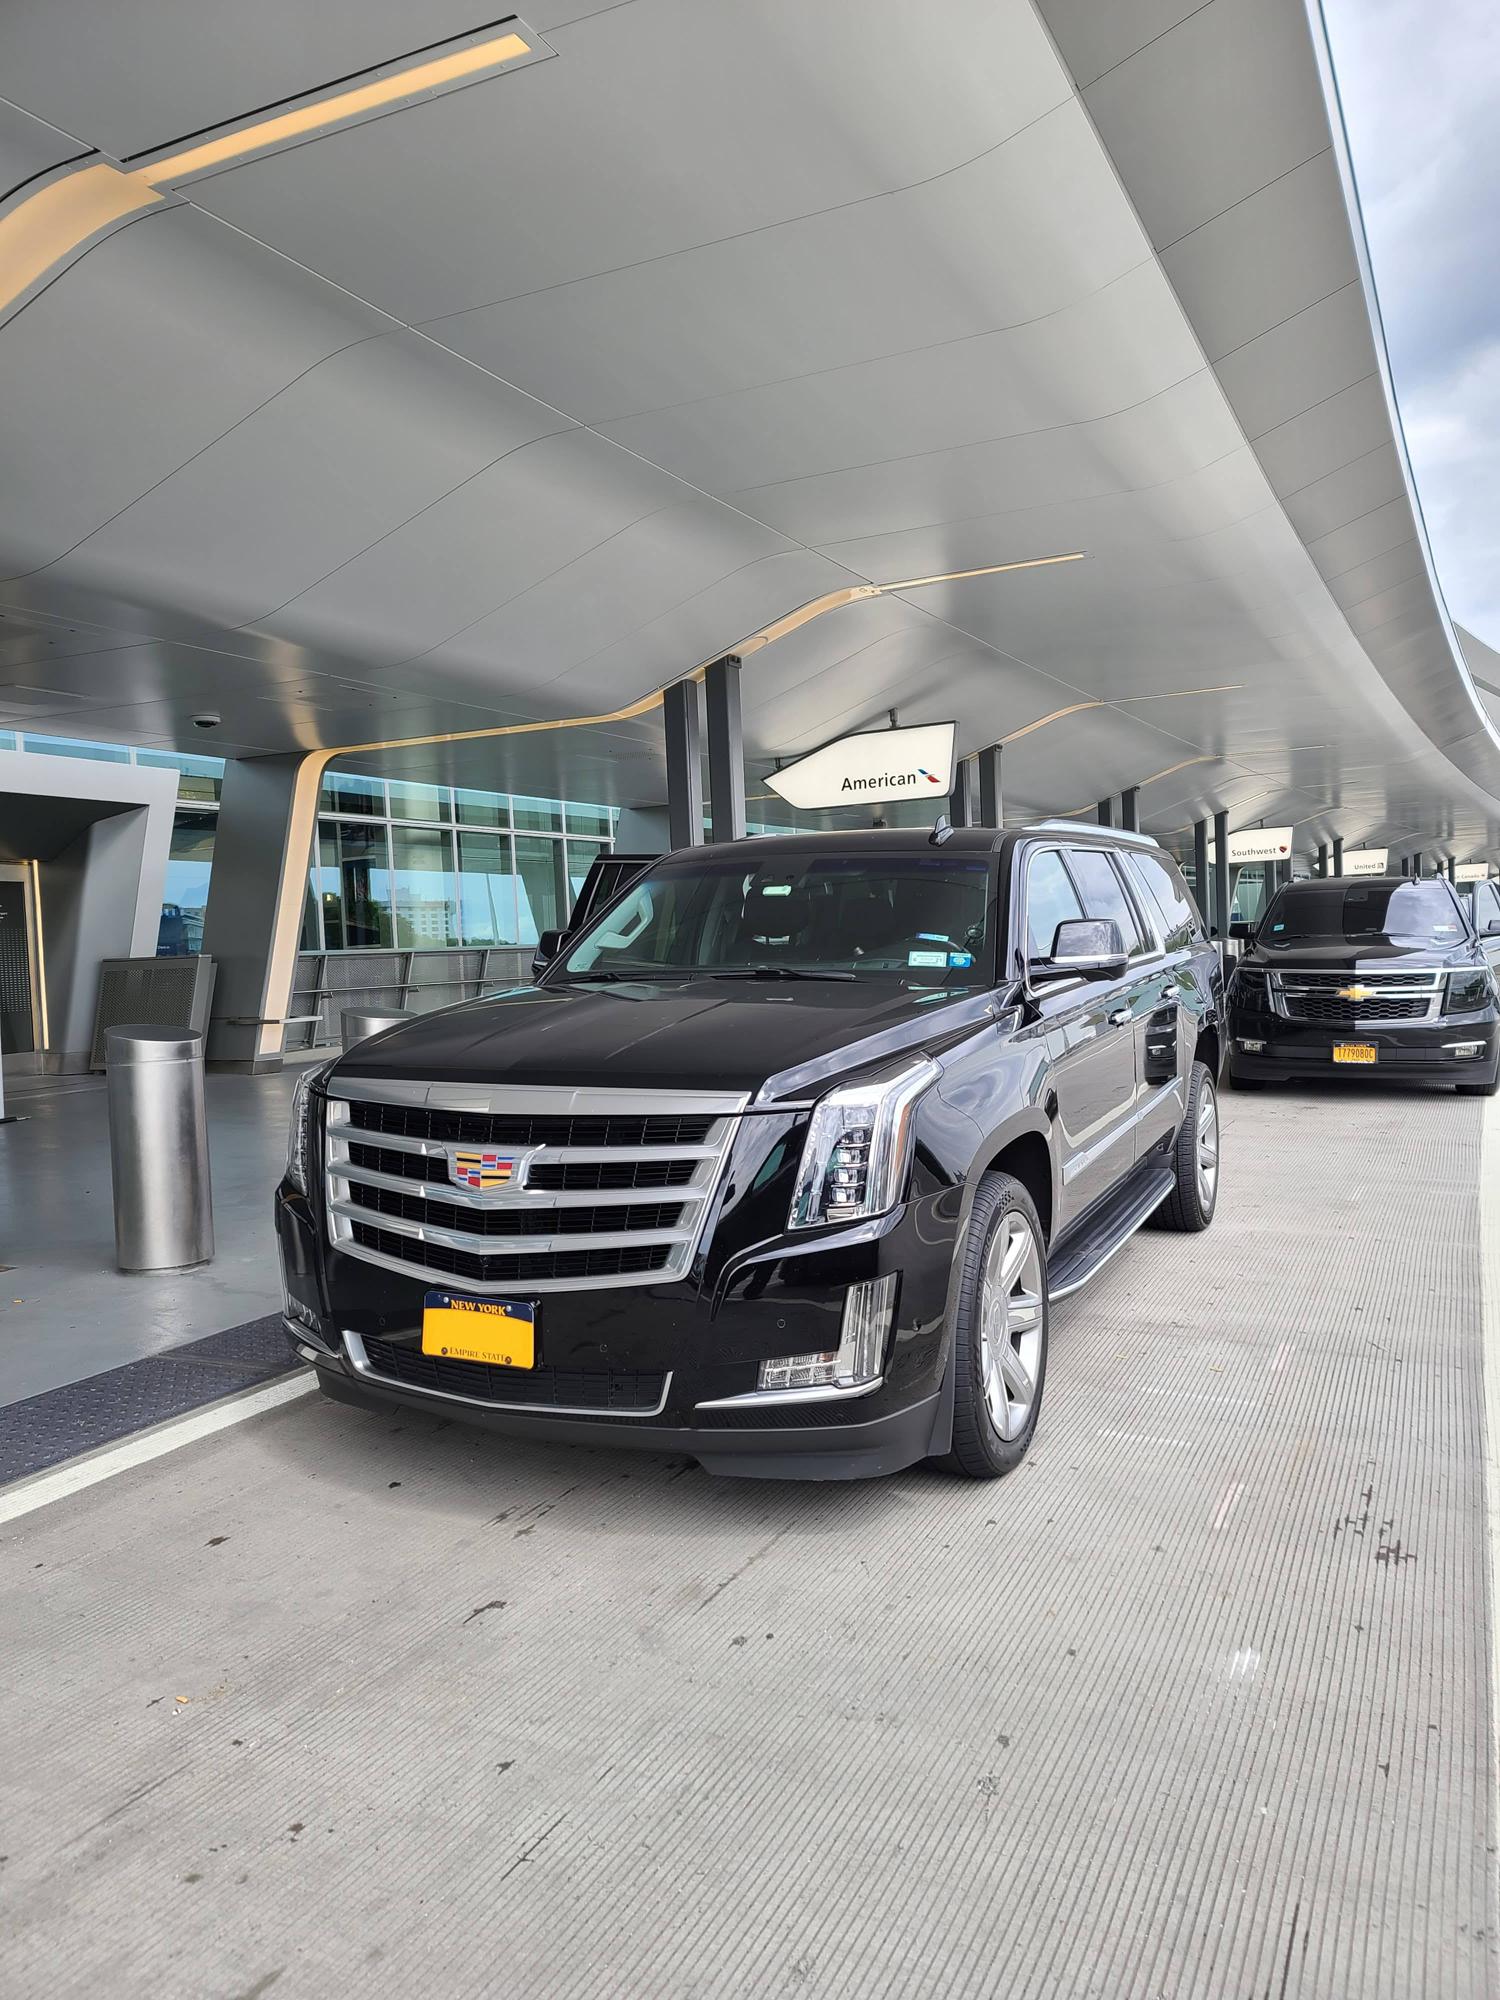 airport car service to long island ny